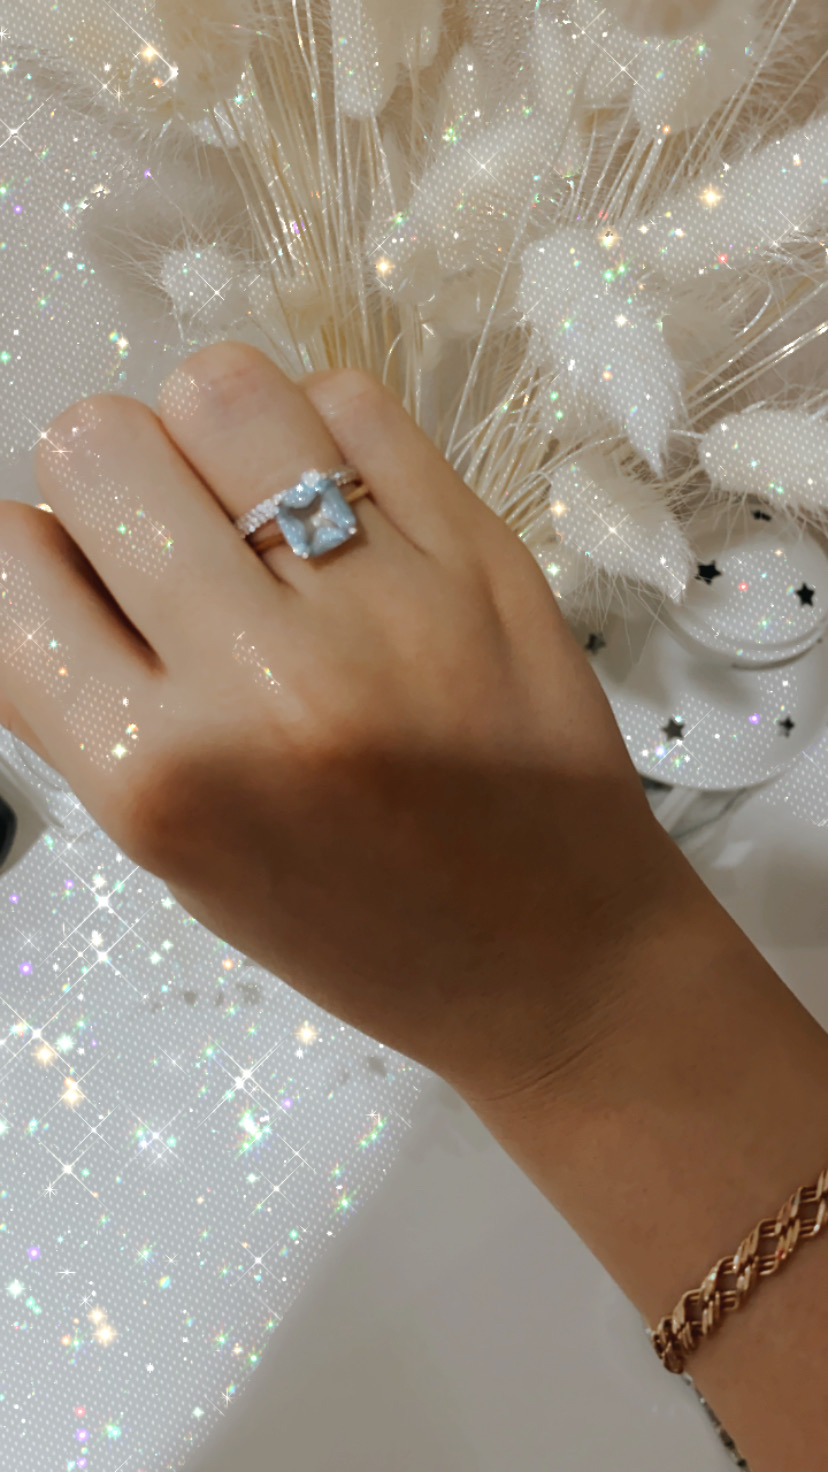 Топаз, камень, кольцо